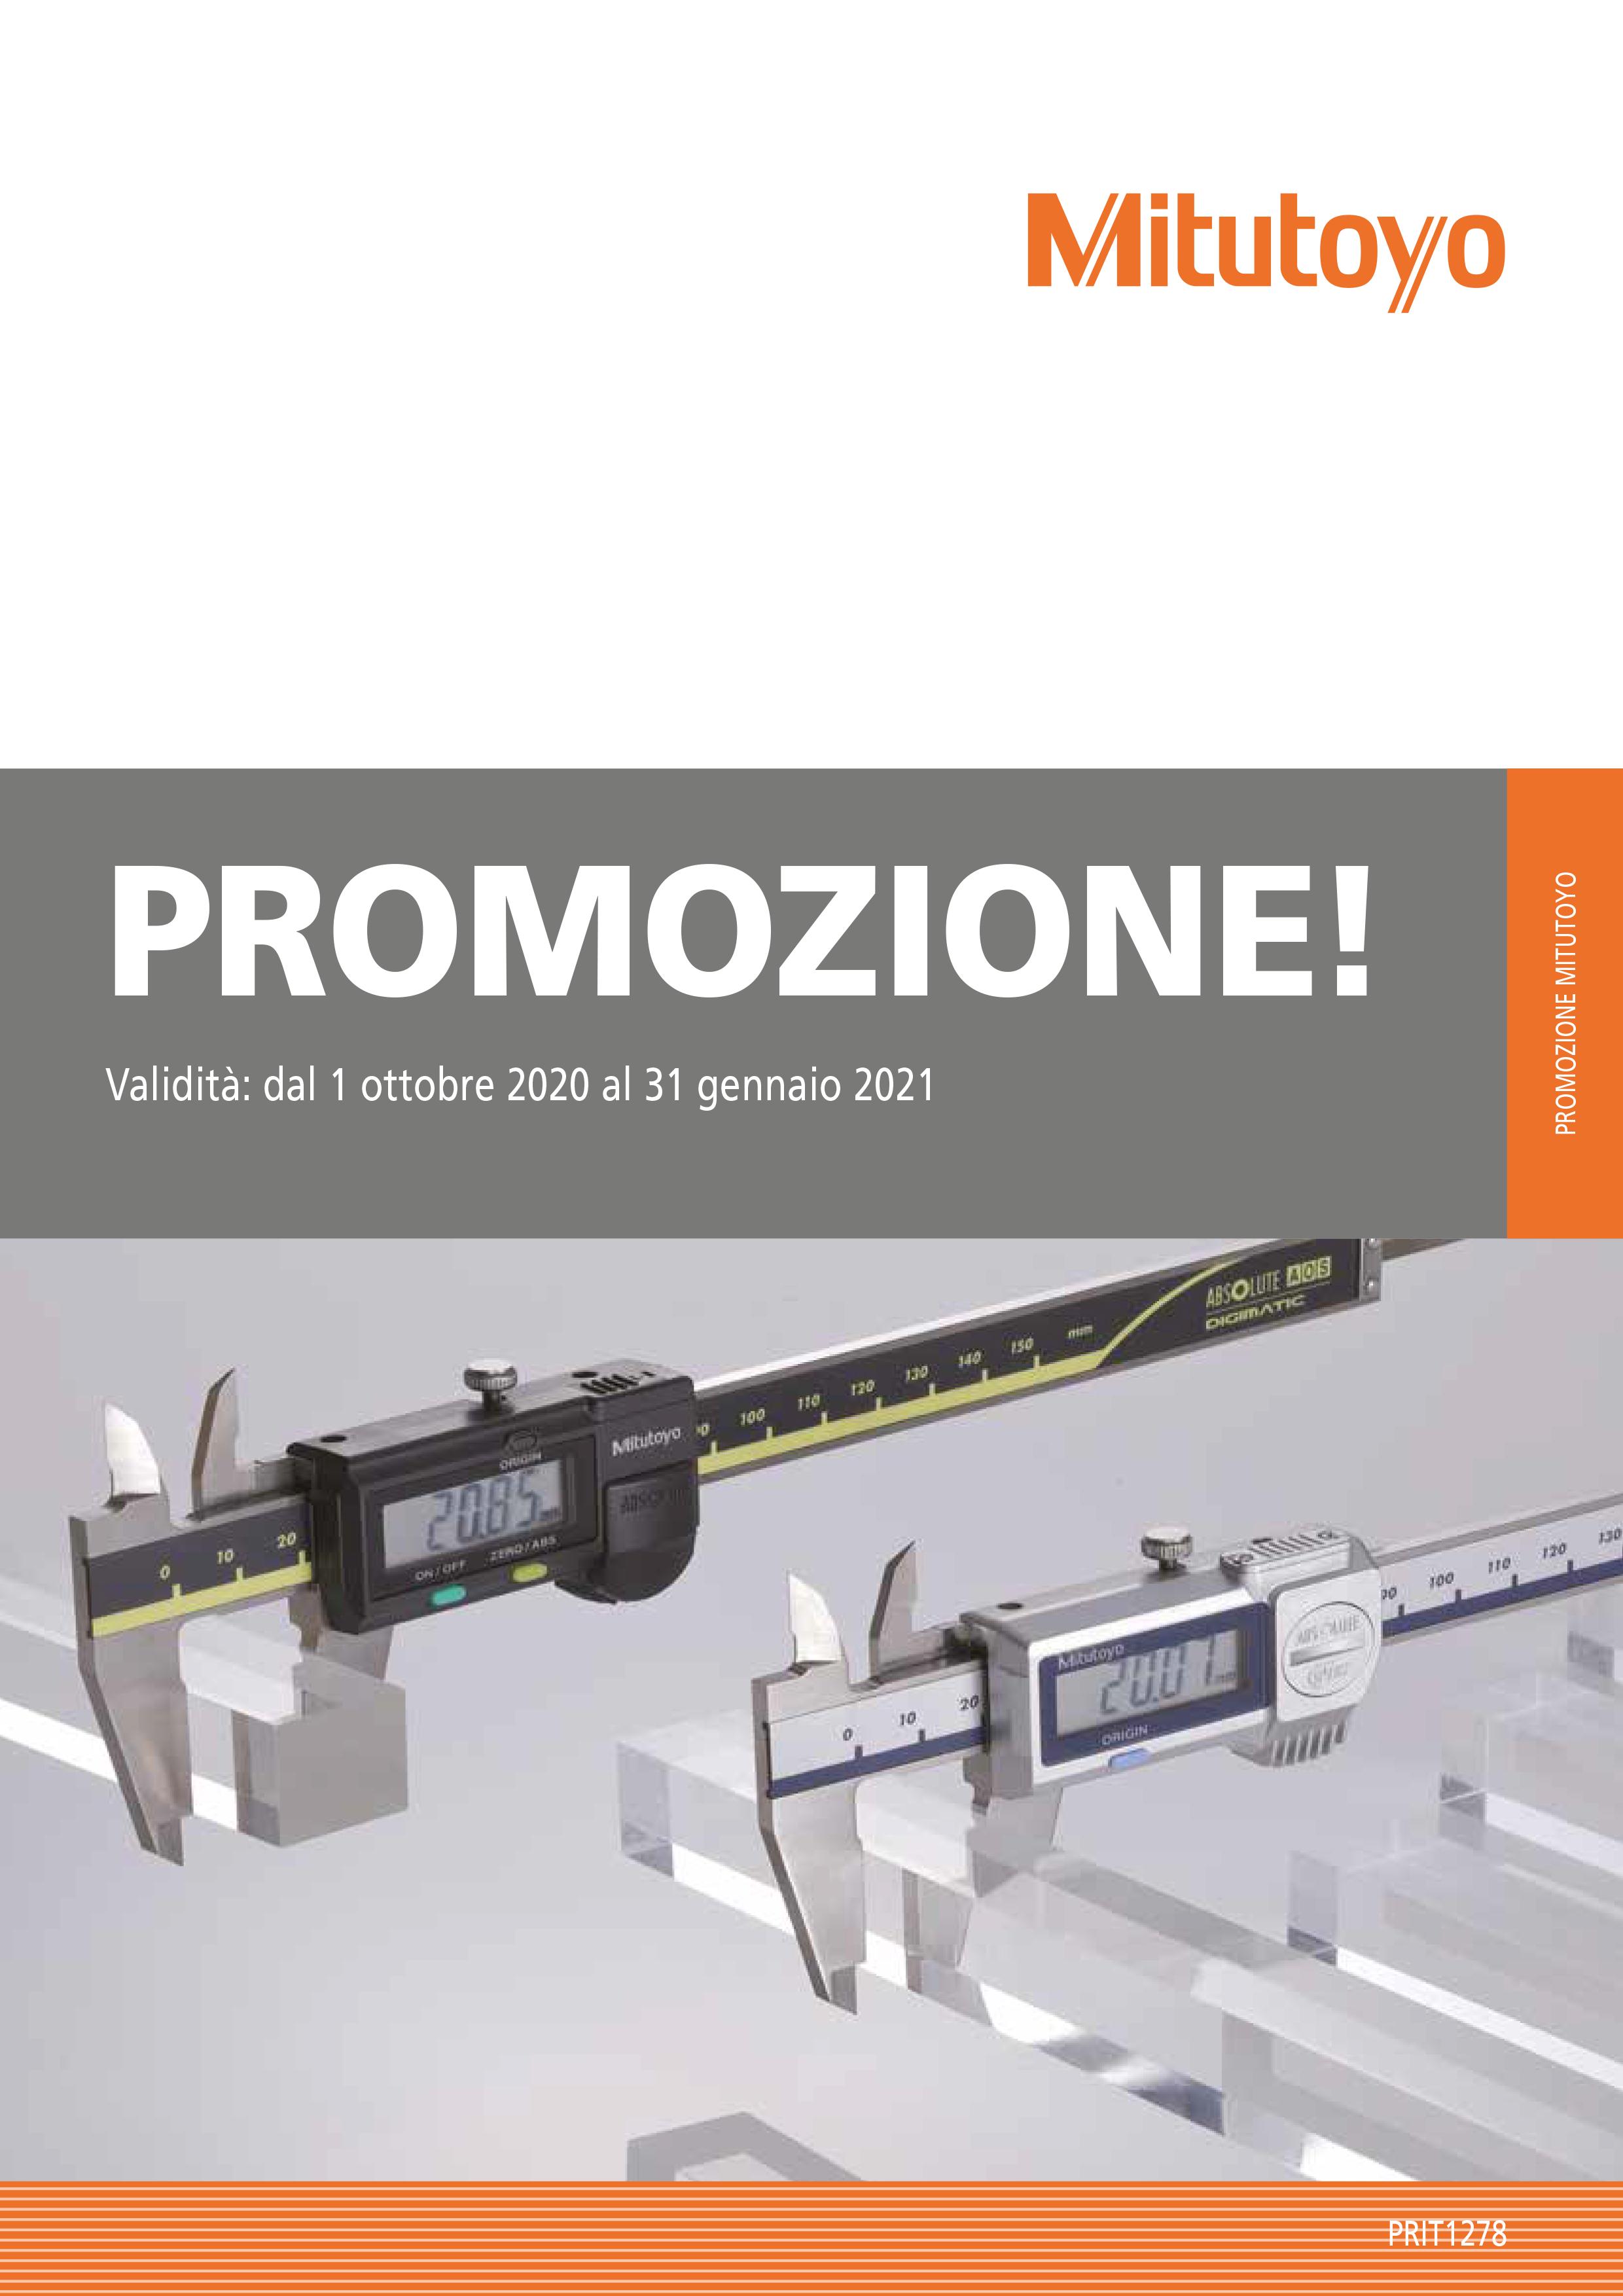 Promo_Mitutoyo_2020_2021_Ramico_Strumenti_Misura_Torino